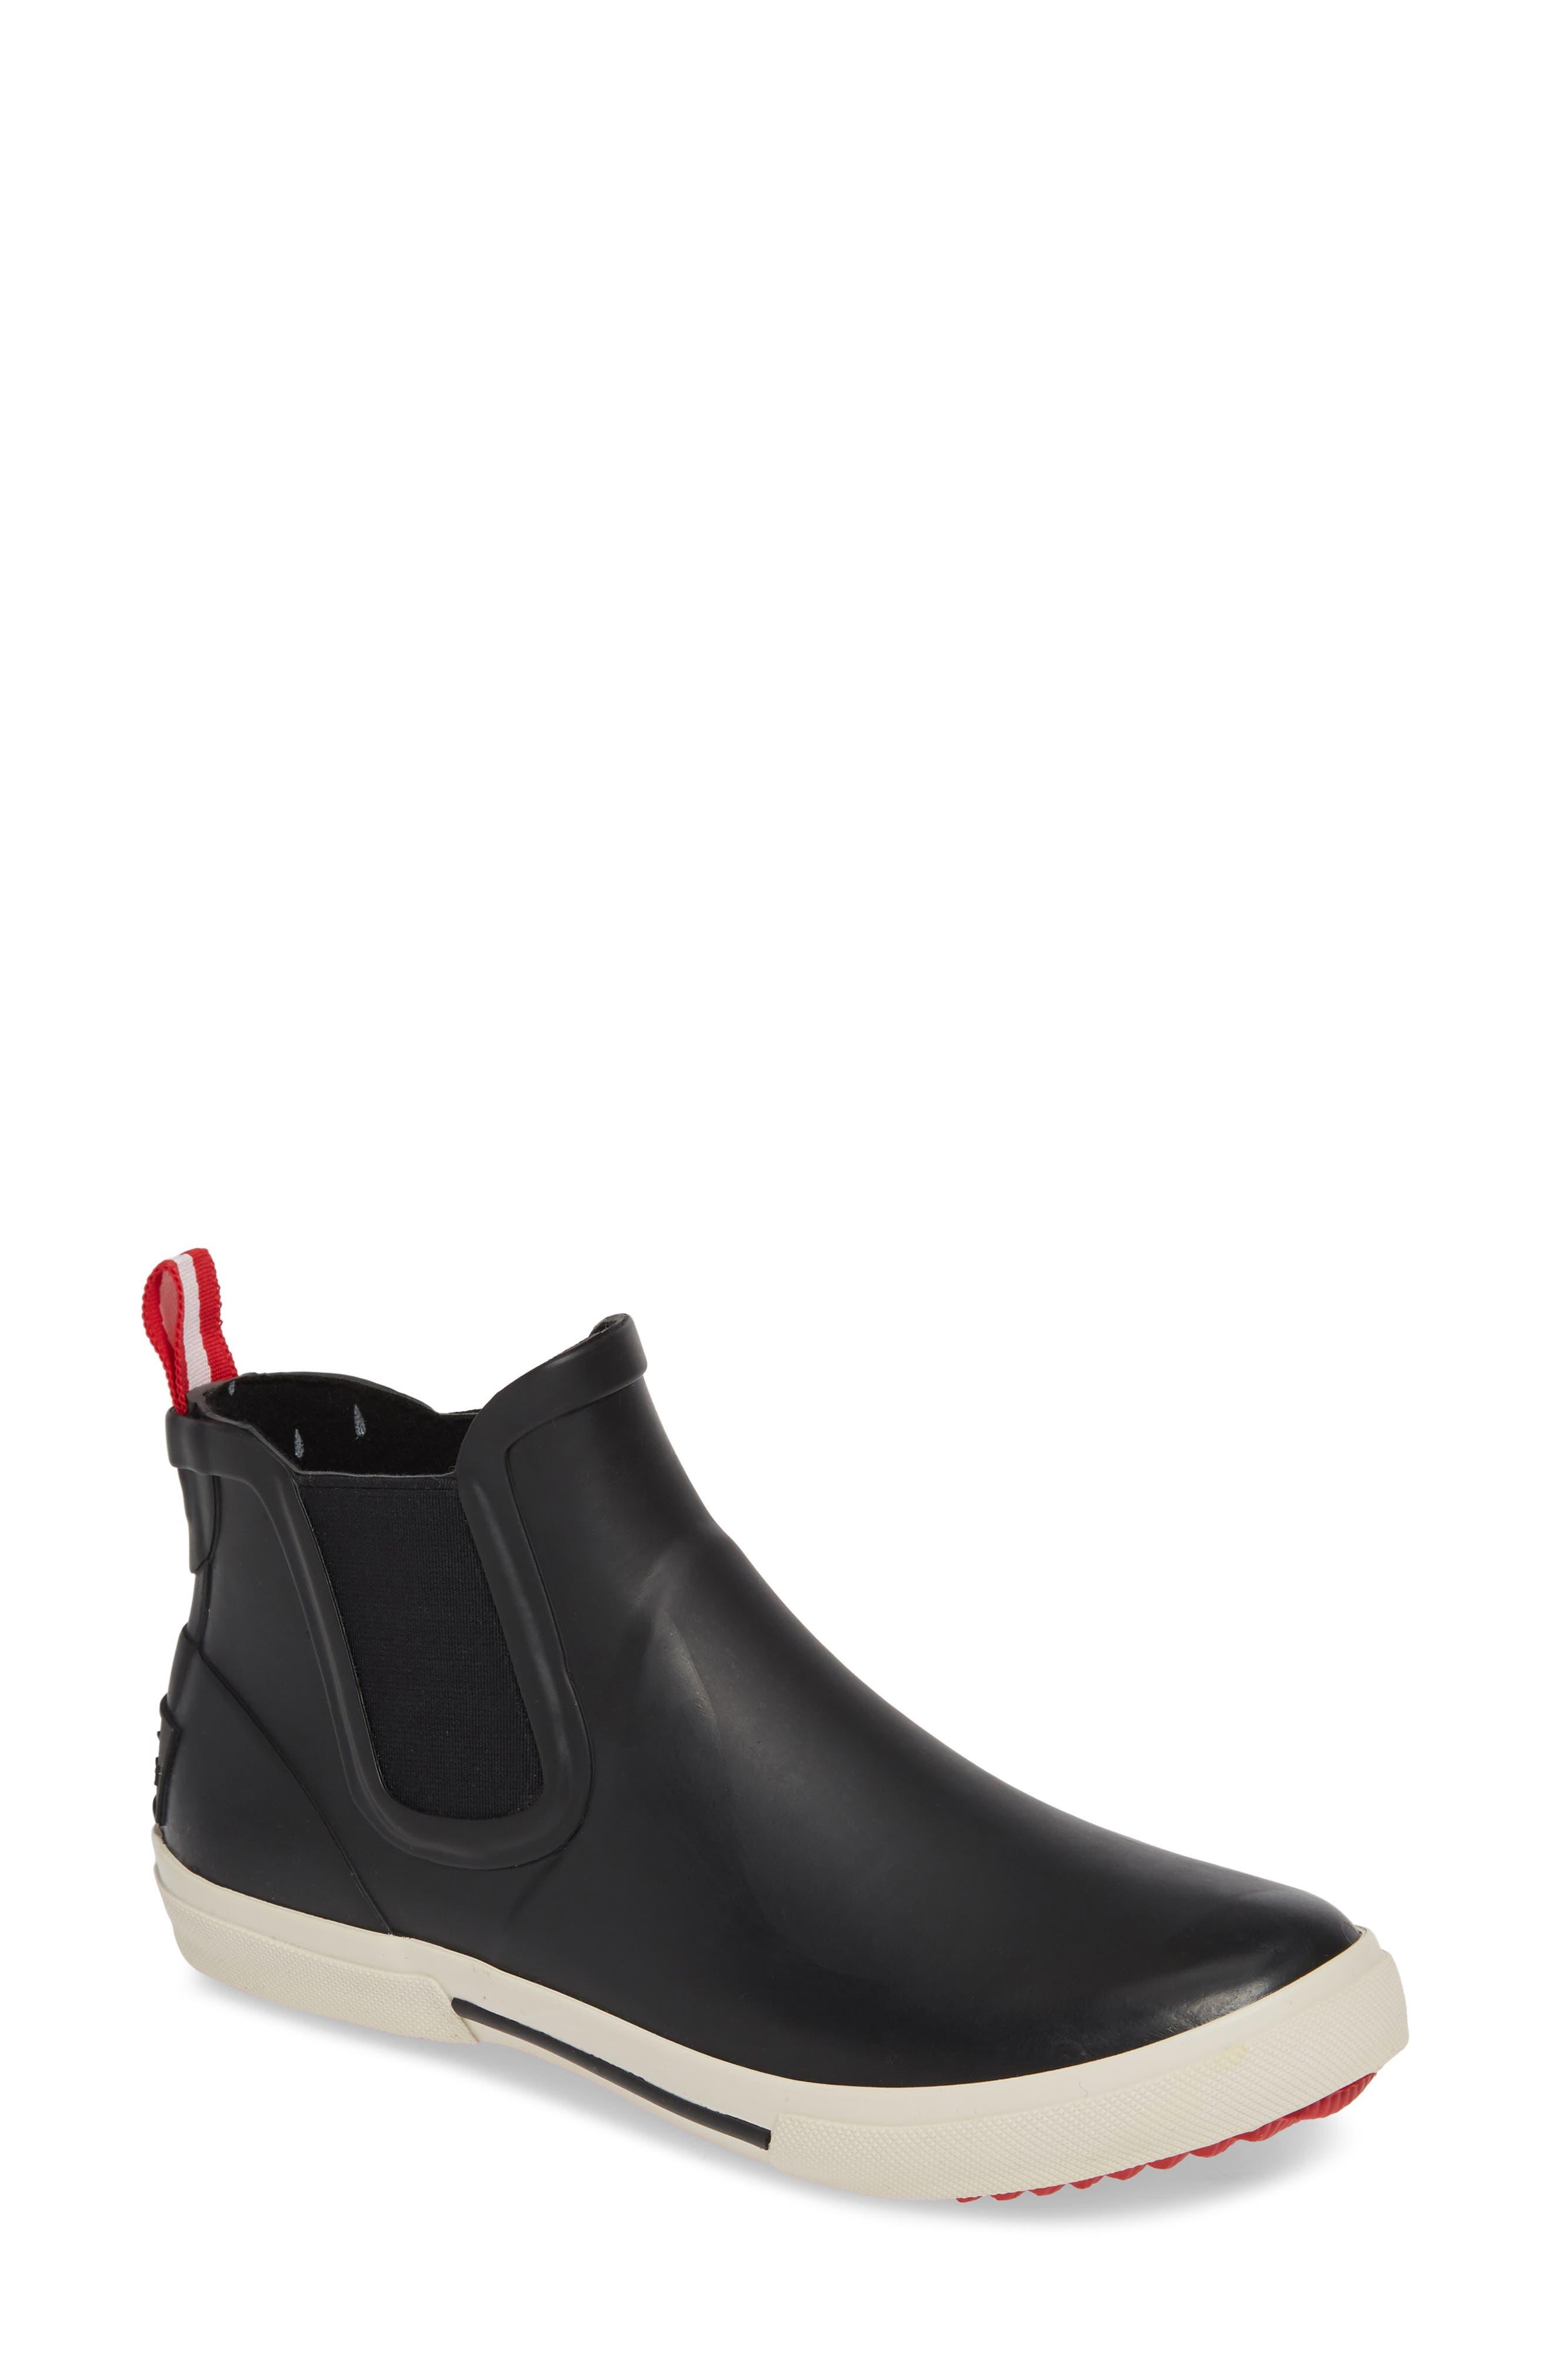 JOULES, Rainwell Waterproof Chelsea Rain Boot, Main thumbnail 1, color, BLACK